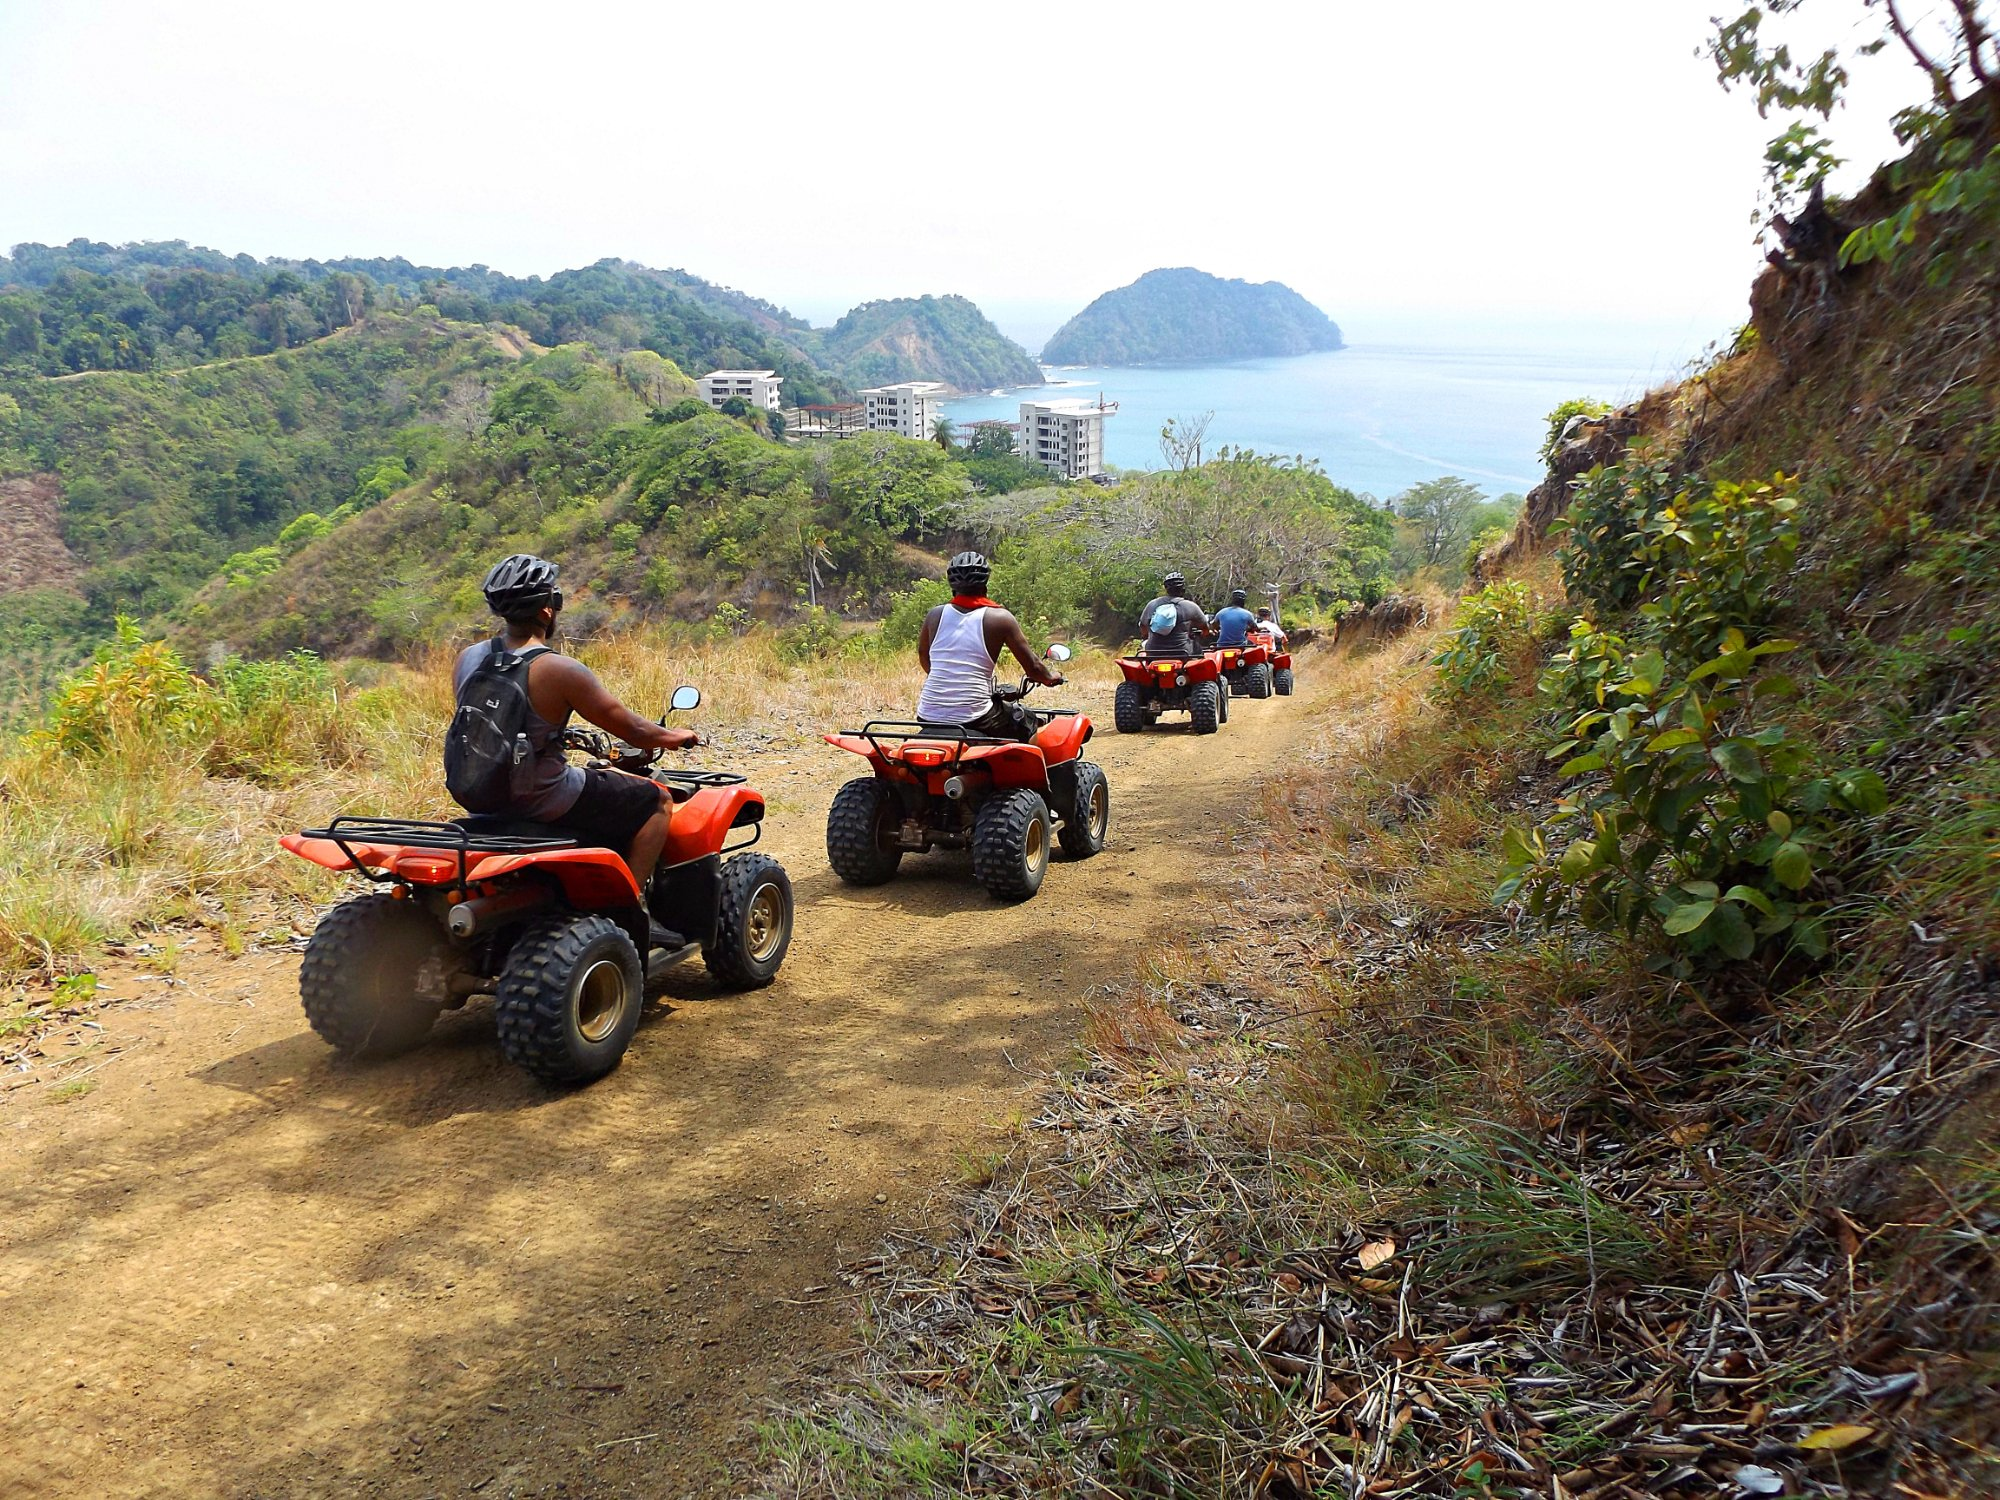 Sueno hotel atlantic golf holidays atlantic golf holidays - Backcountry Atv Tours